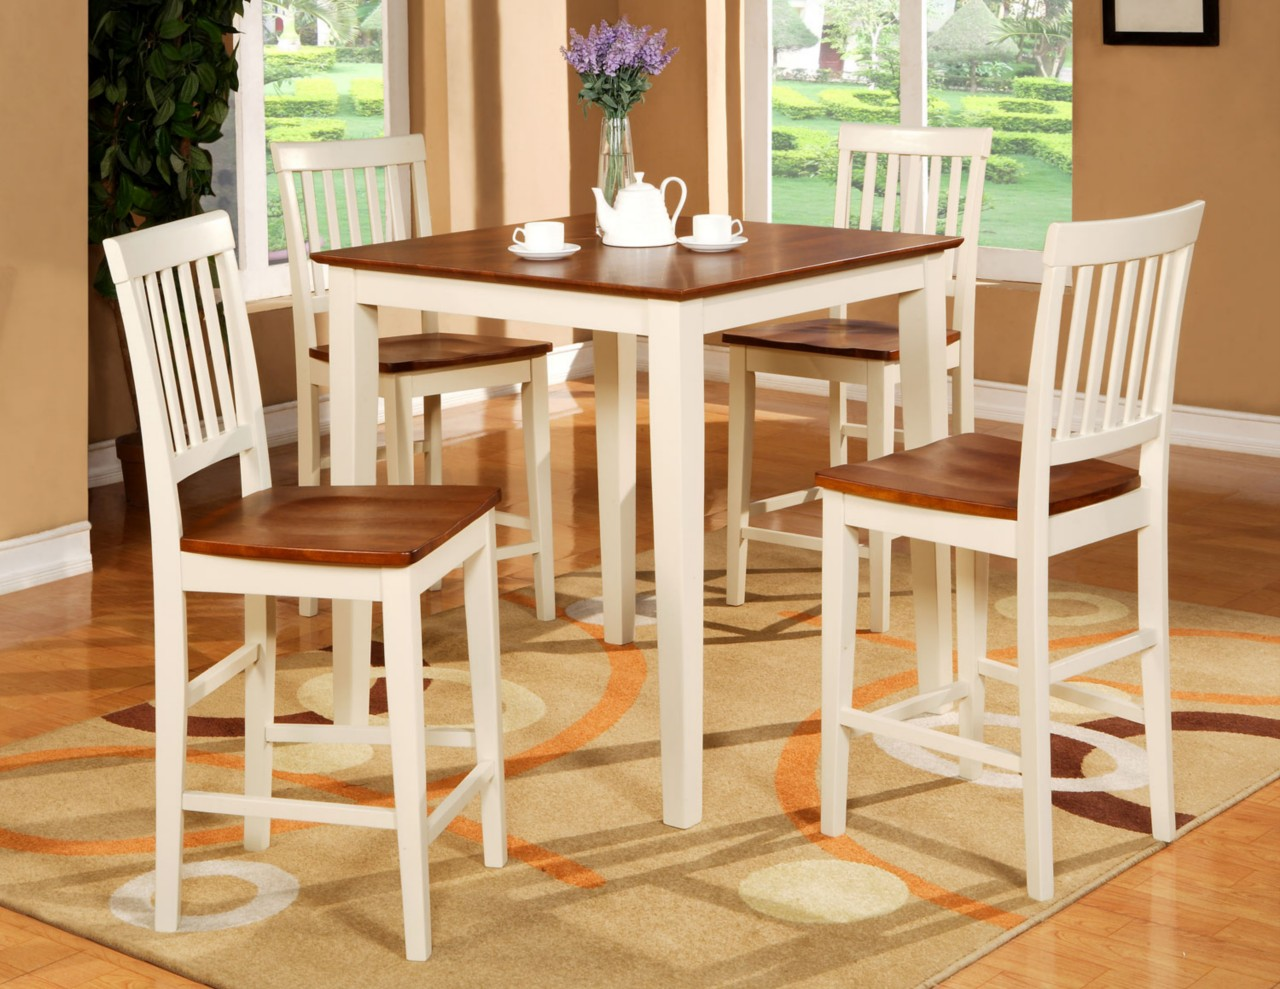 5PC SQUARE PUB COUNTER HEIGHT TABLE SET 4 STOOLS WHITE  eBay